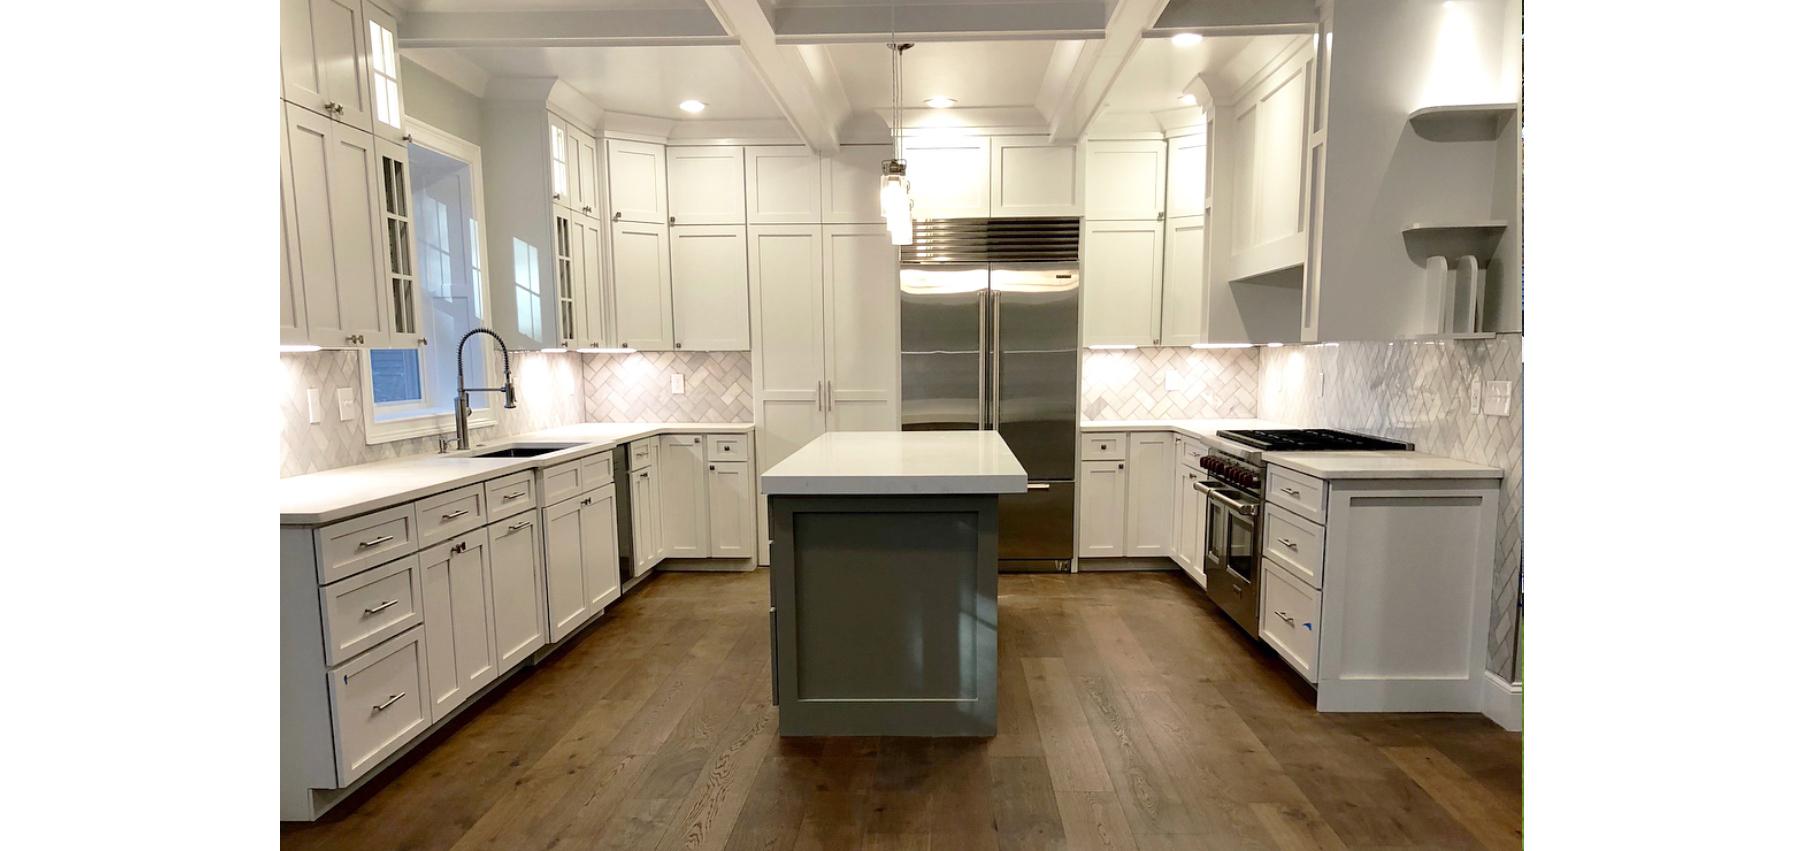 HIGH END HOMES U2013 Home Builder U0026 Realty Co.   Natick, MA (508) 975 4577